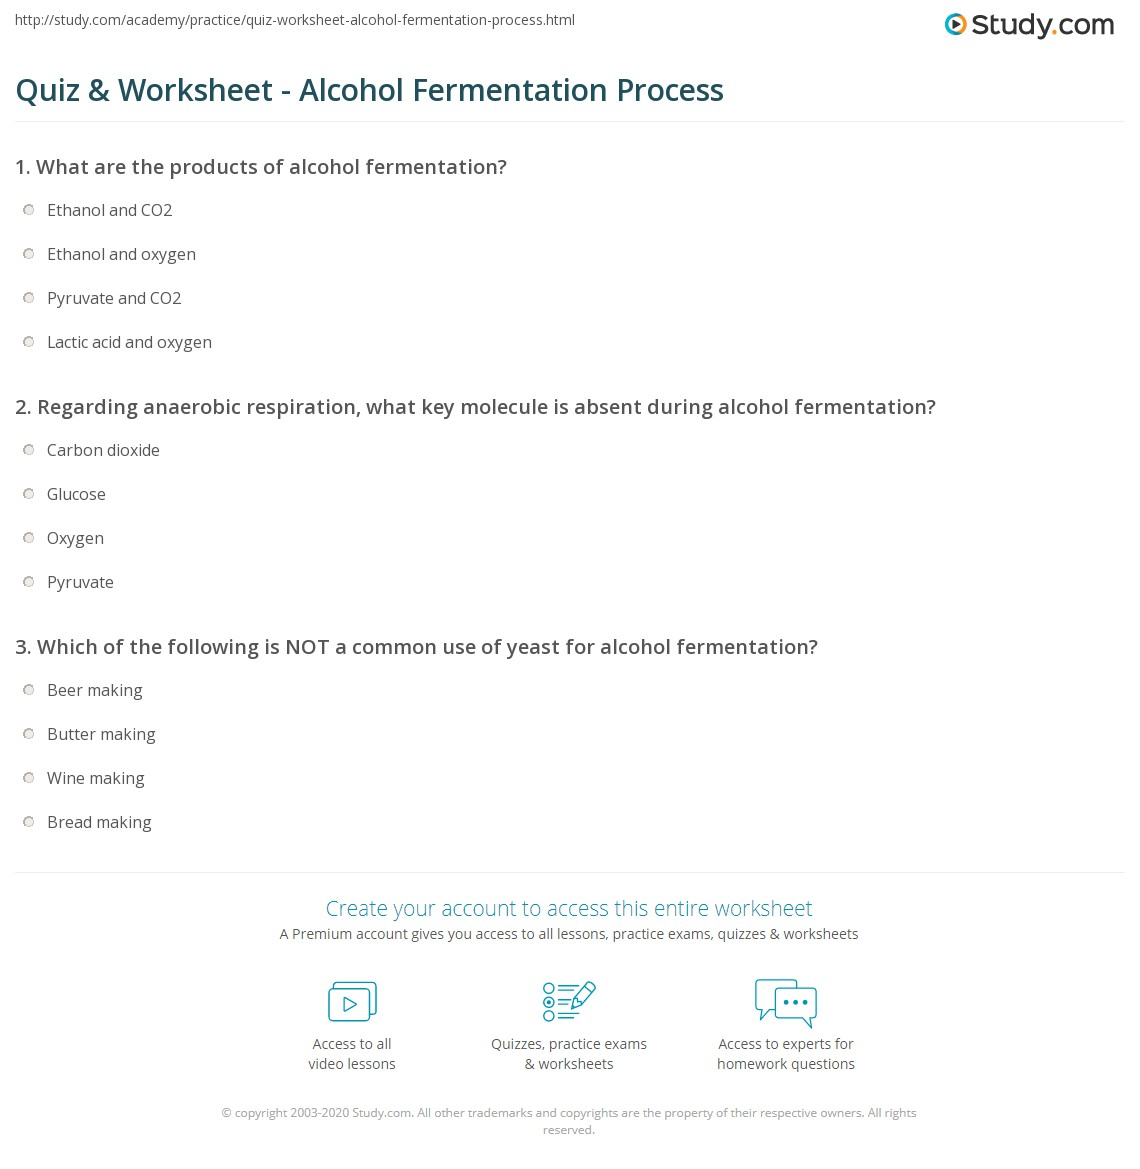 quiz & worksheet - alcohol fermentation process | study